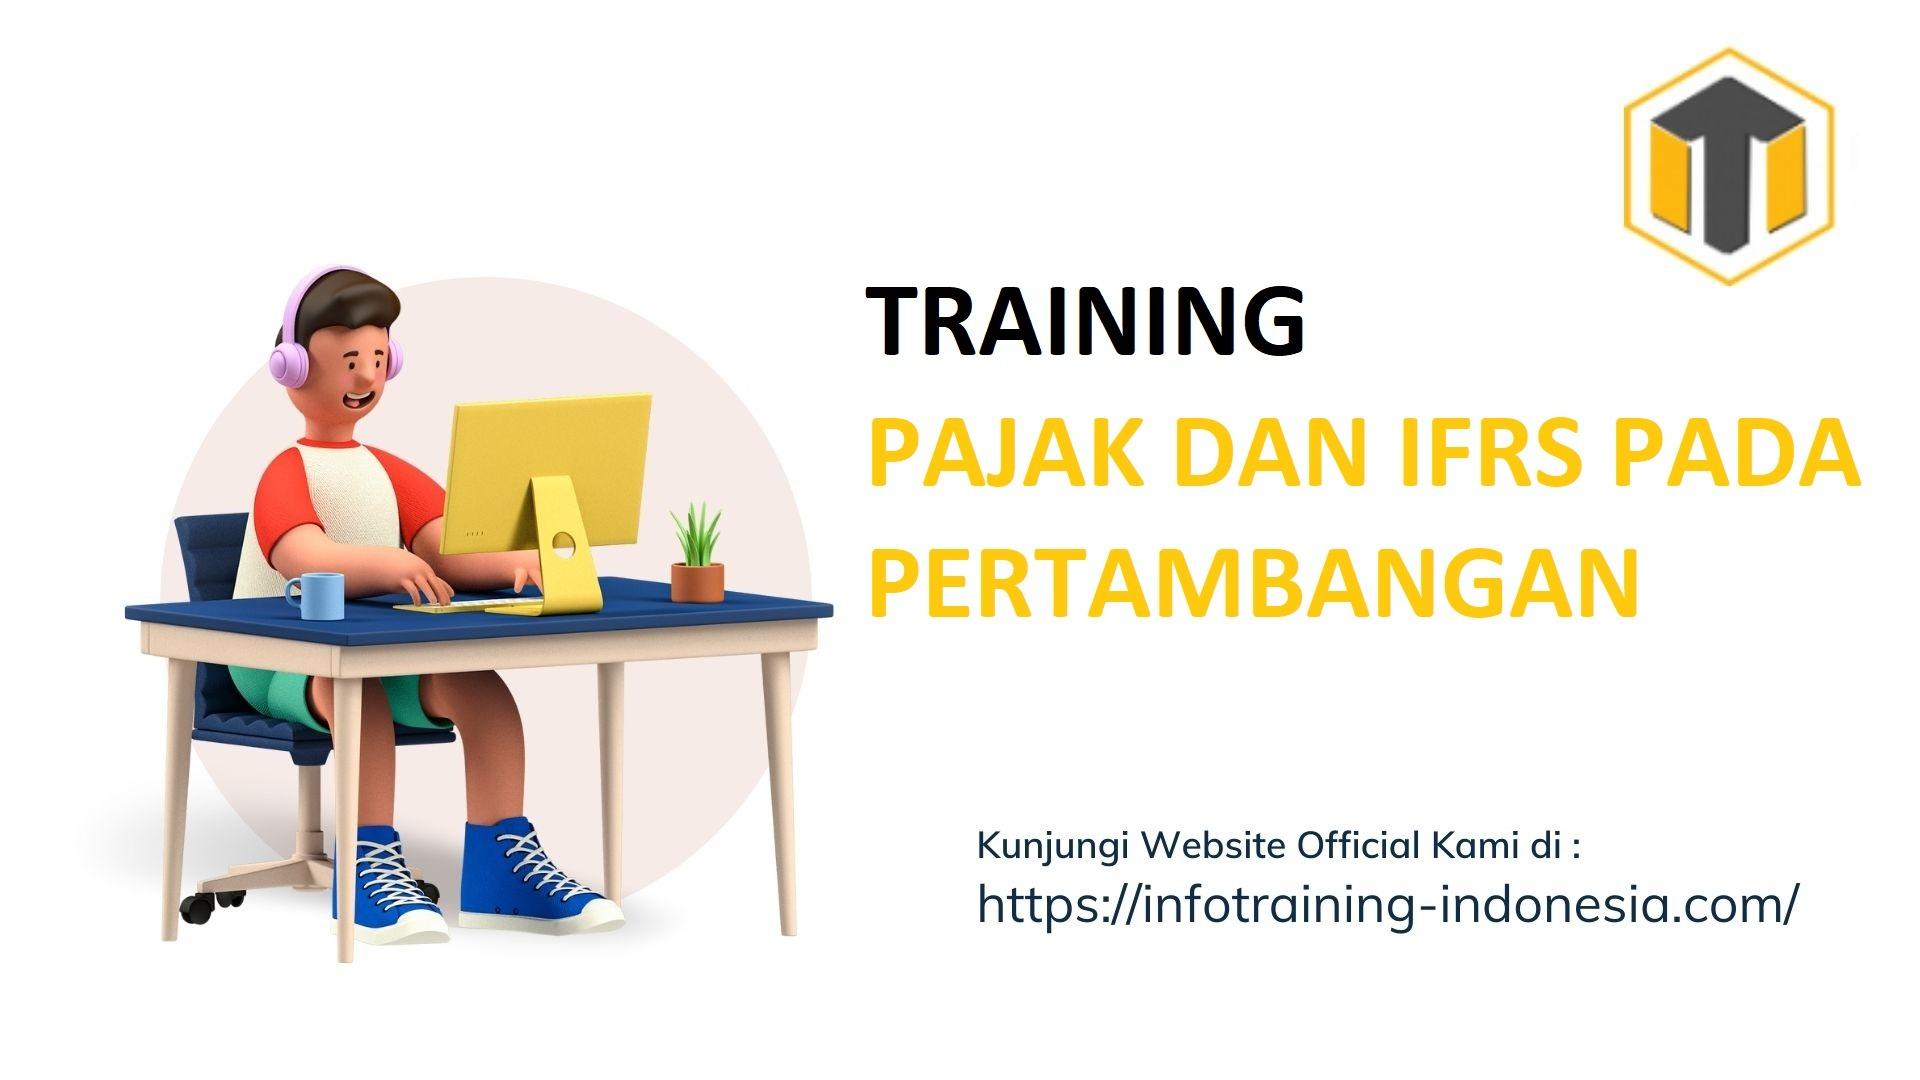 TRAINING PAJAK DAN IFRS PADA PERTAMBANGAN Training Based Industry